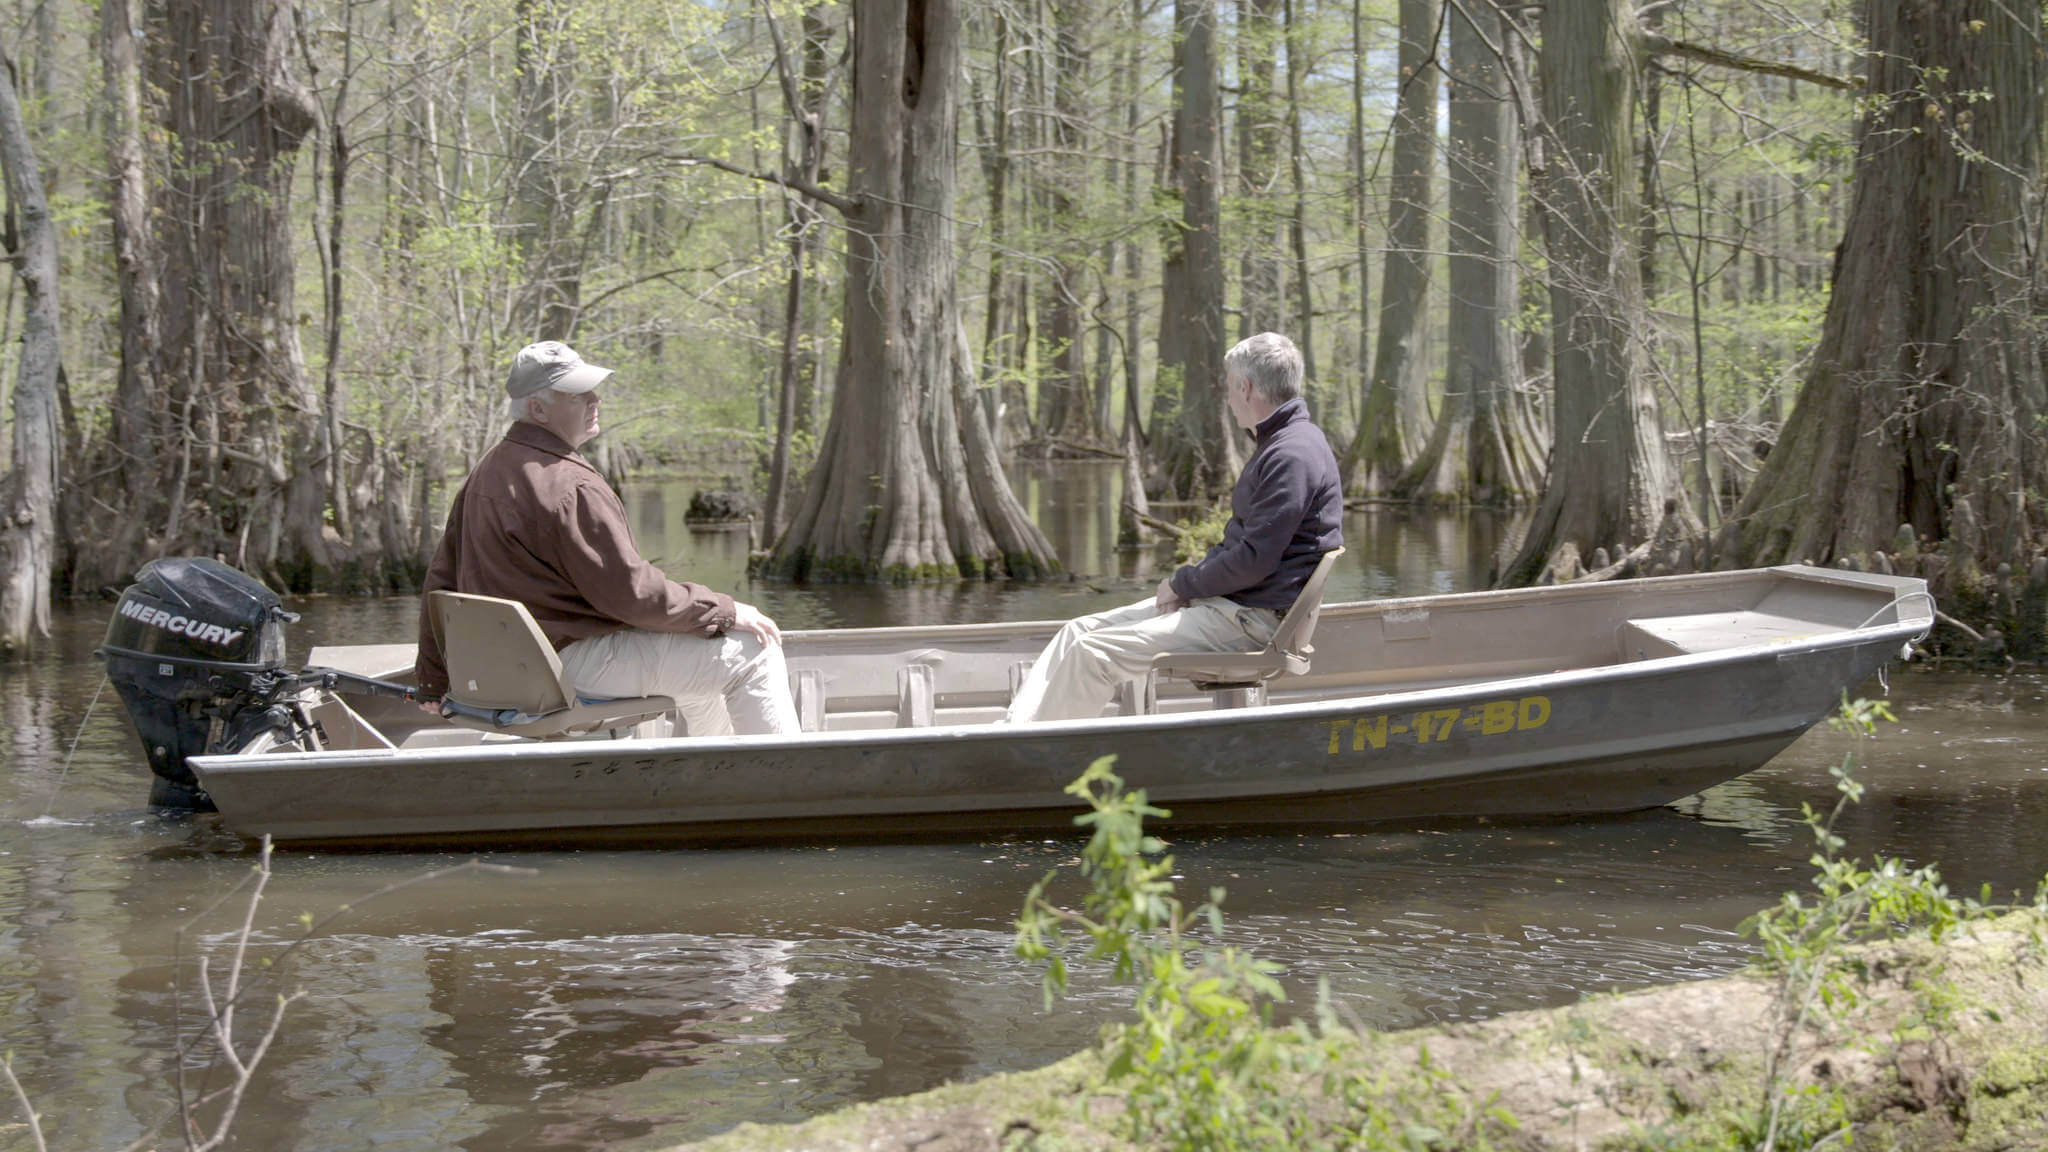 Stuart Burgess and Del Tackett in a boat on Reelfoot Lake